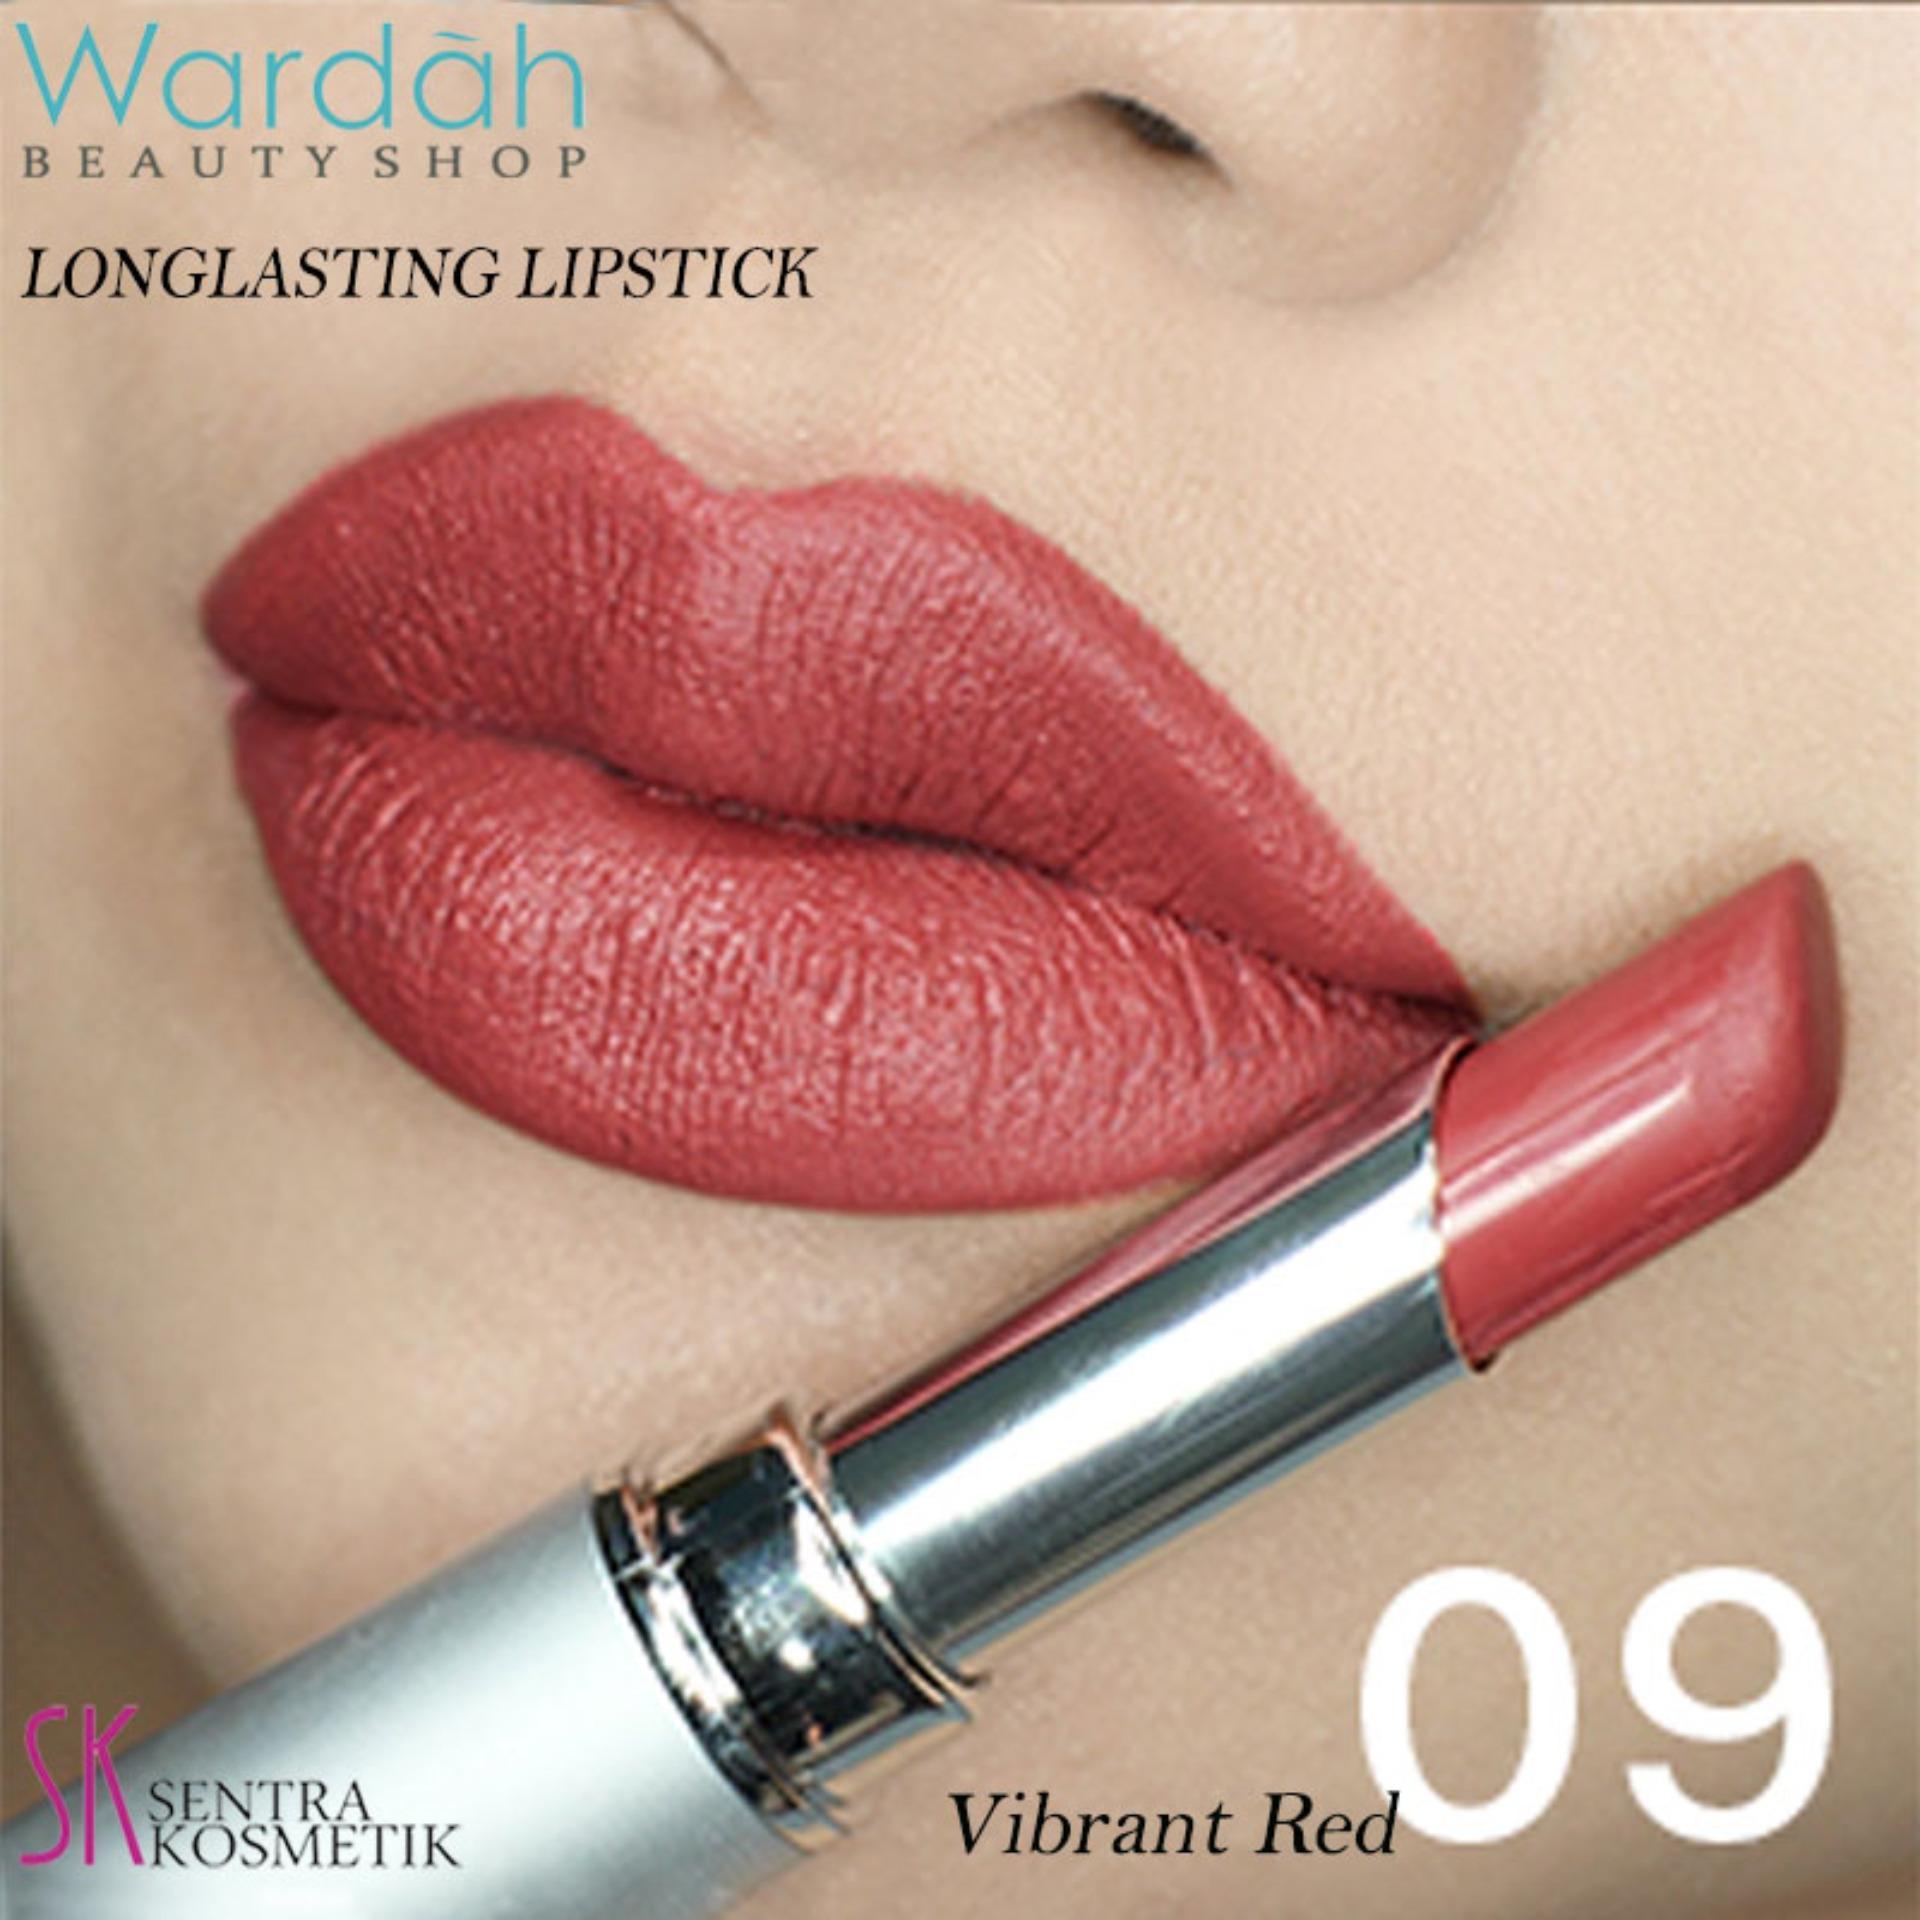 Wardah LONGLASTING Lipstick No.09 Vibrant Red